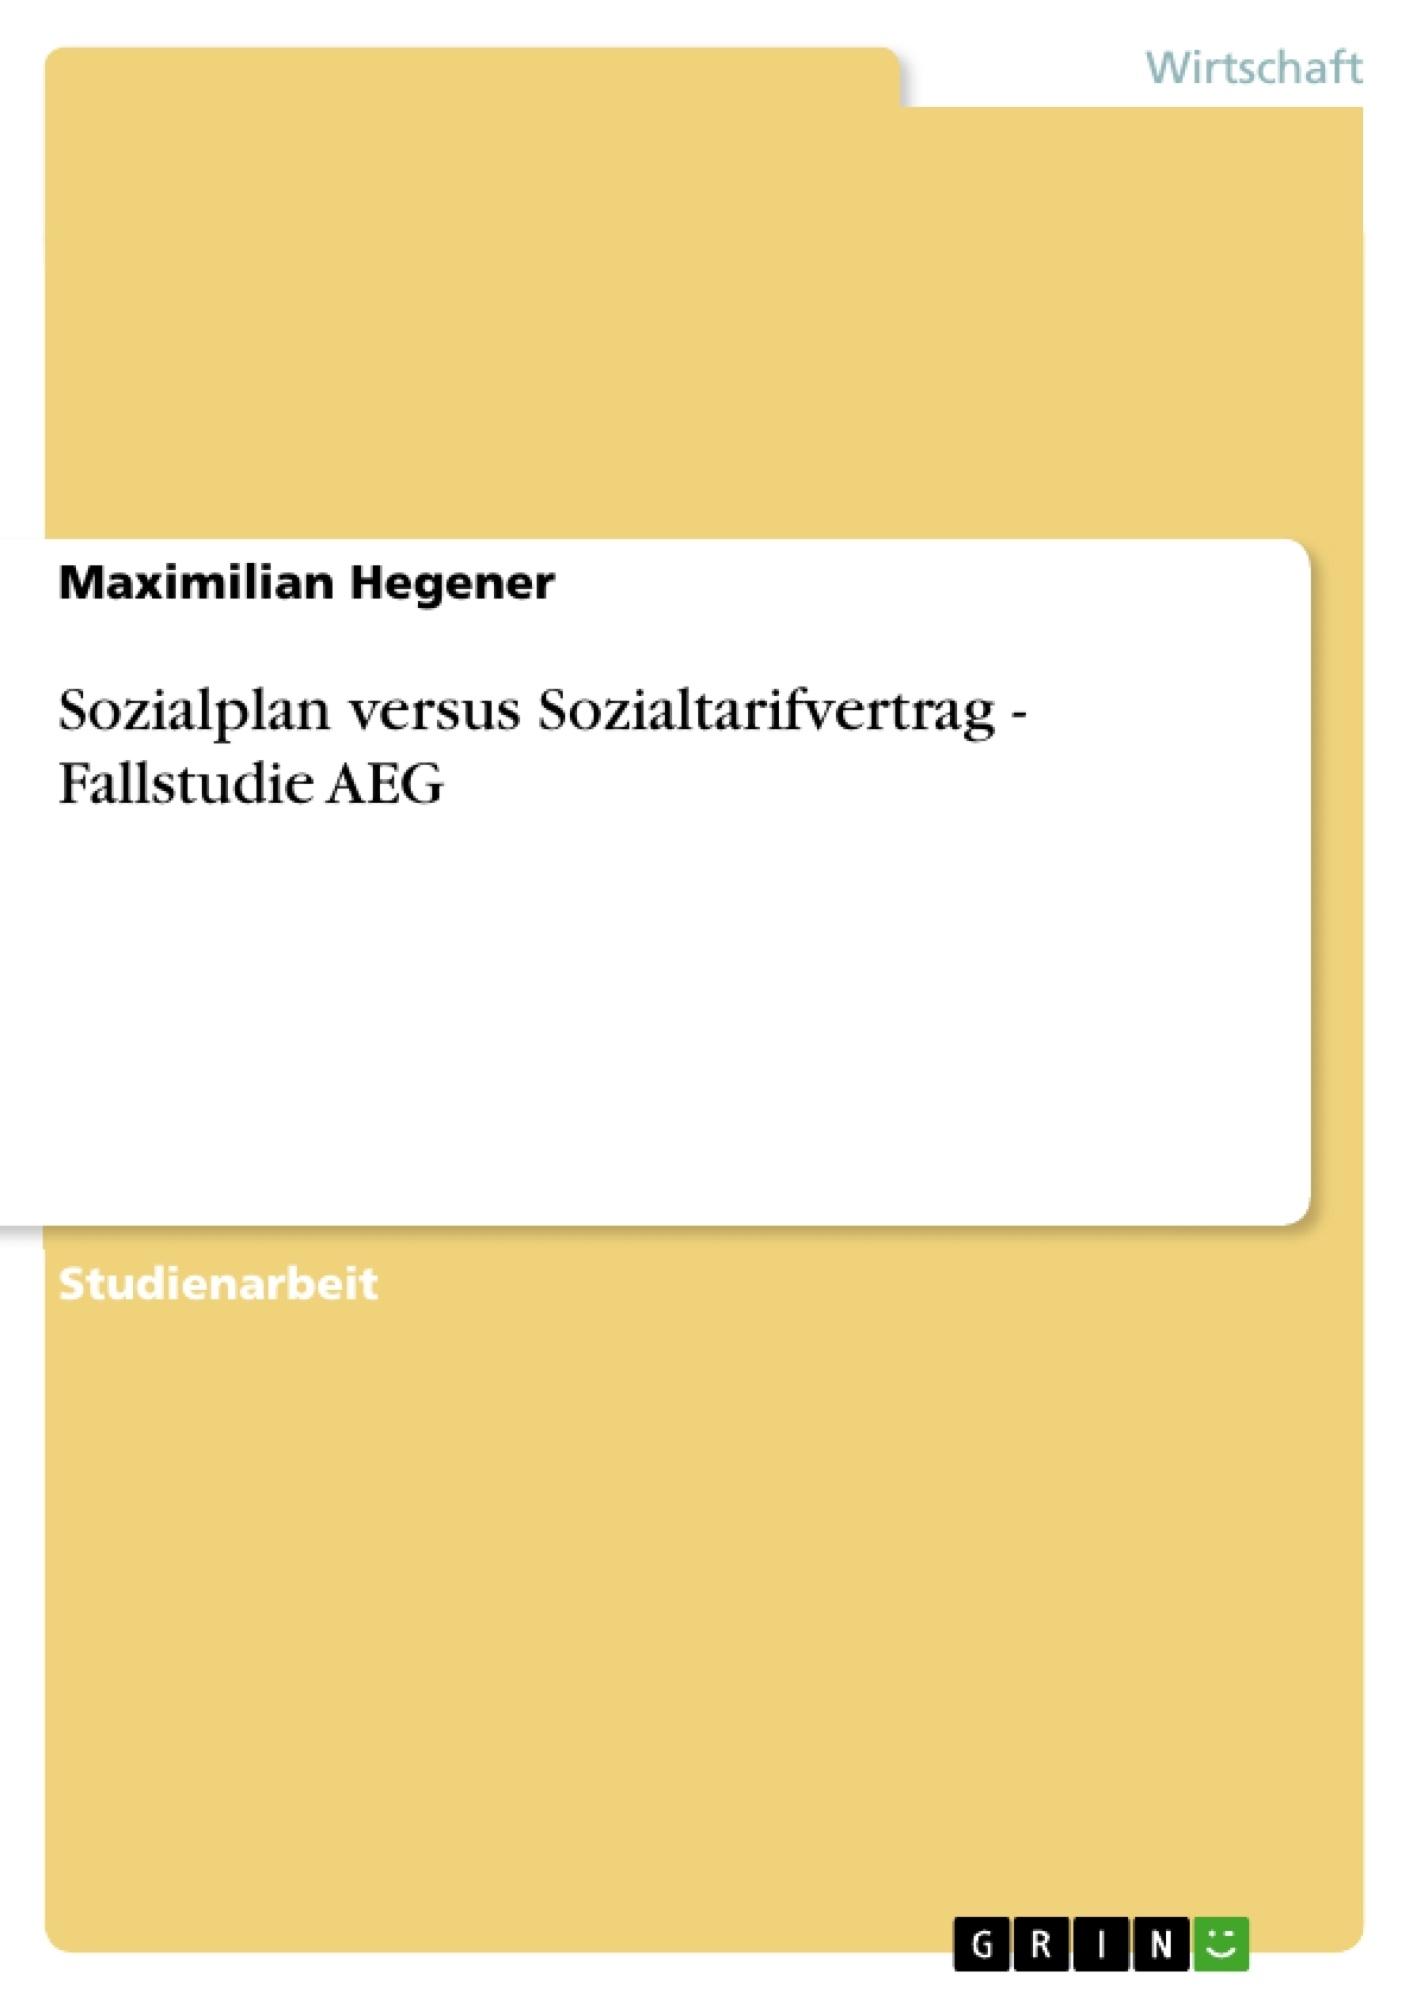 Titel: Sozialplan versus Sozialtarifvertrag - Fallstudie AEG